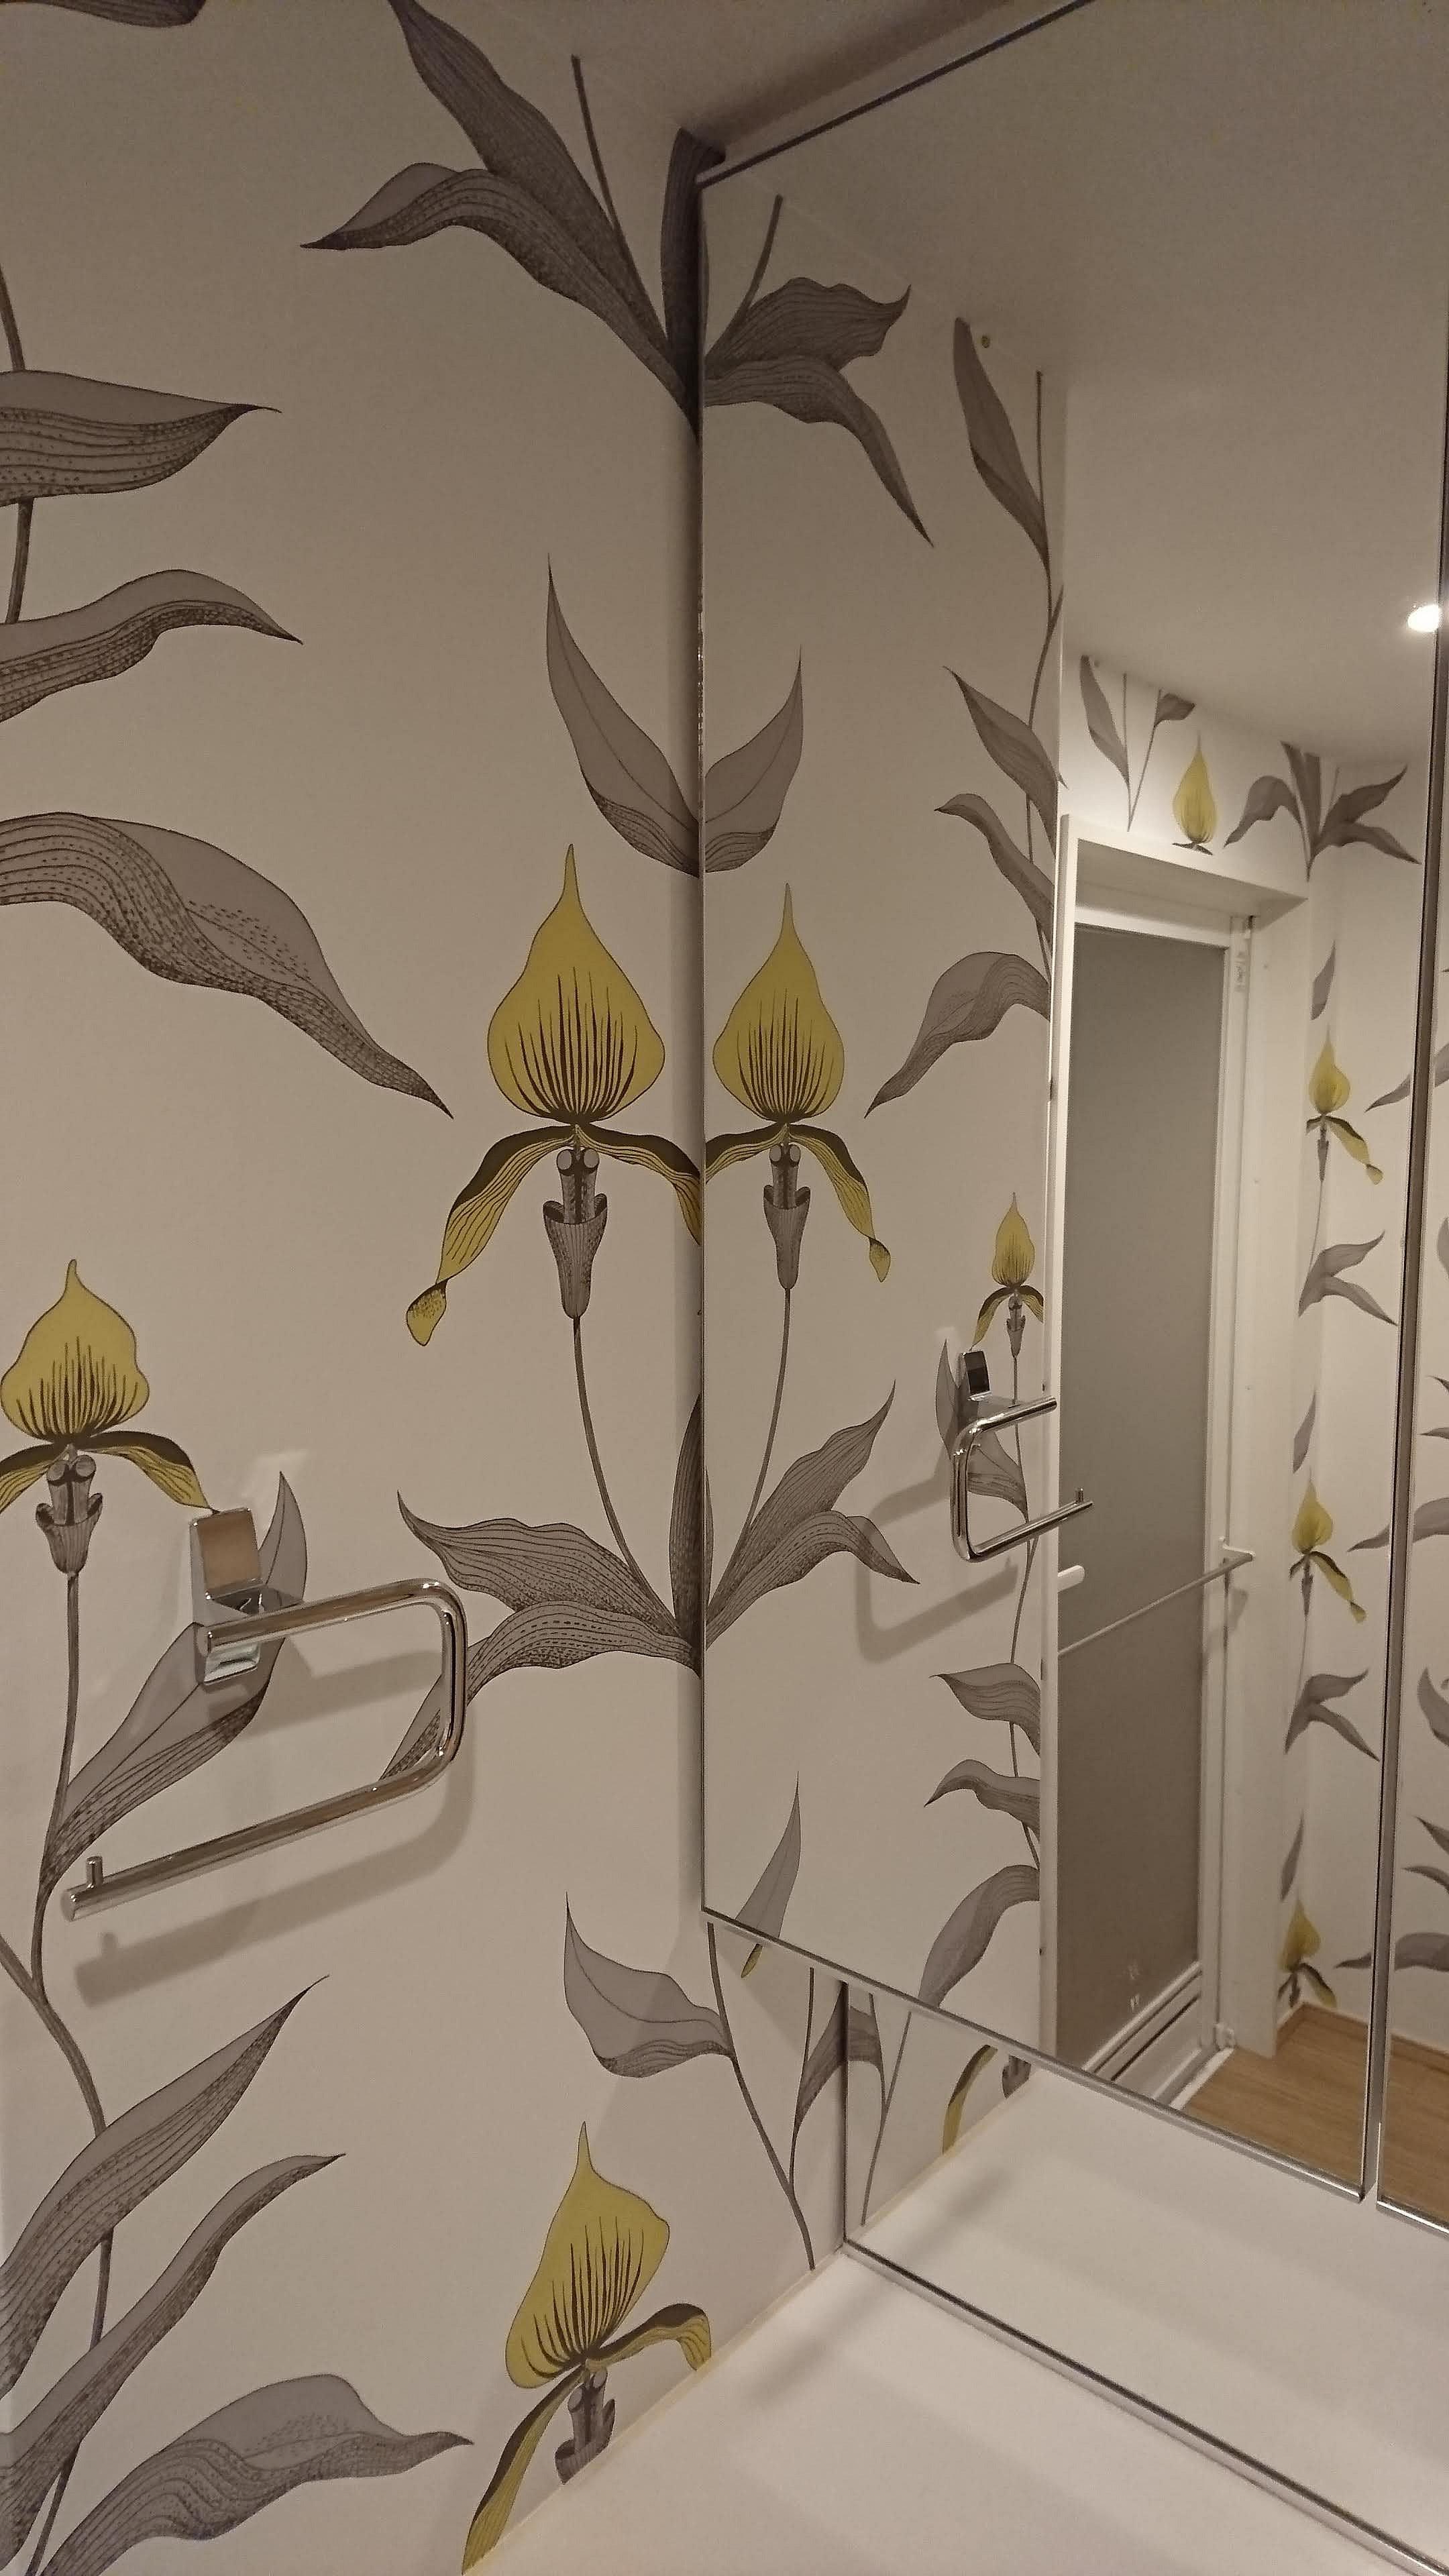 Orchid施行写真1